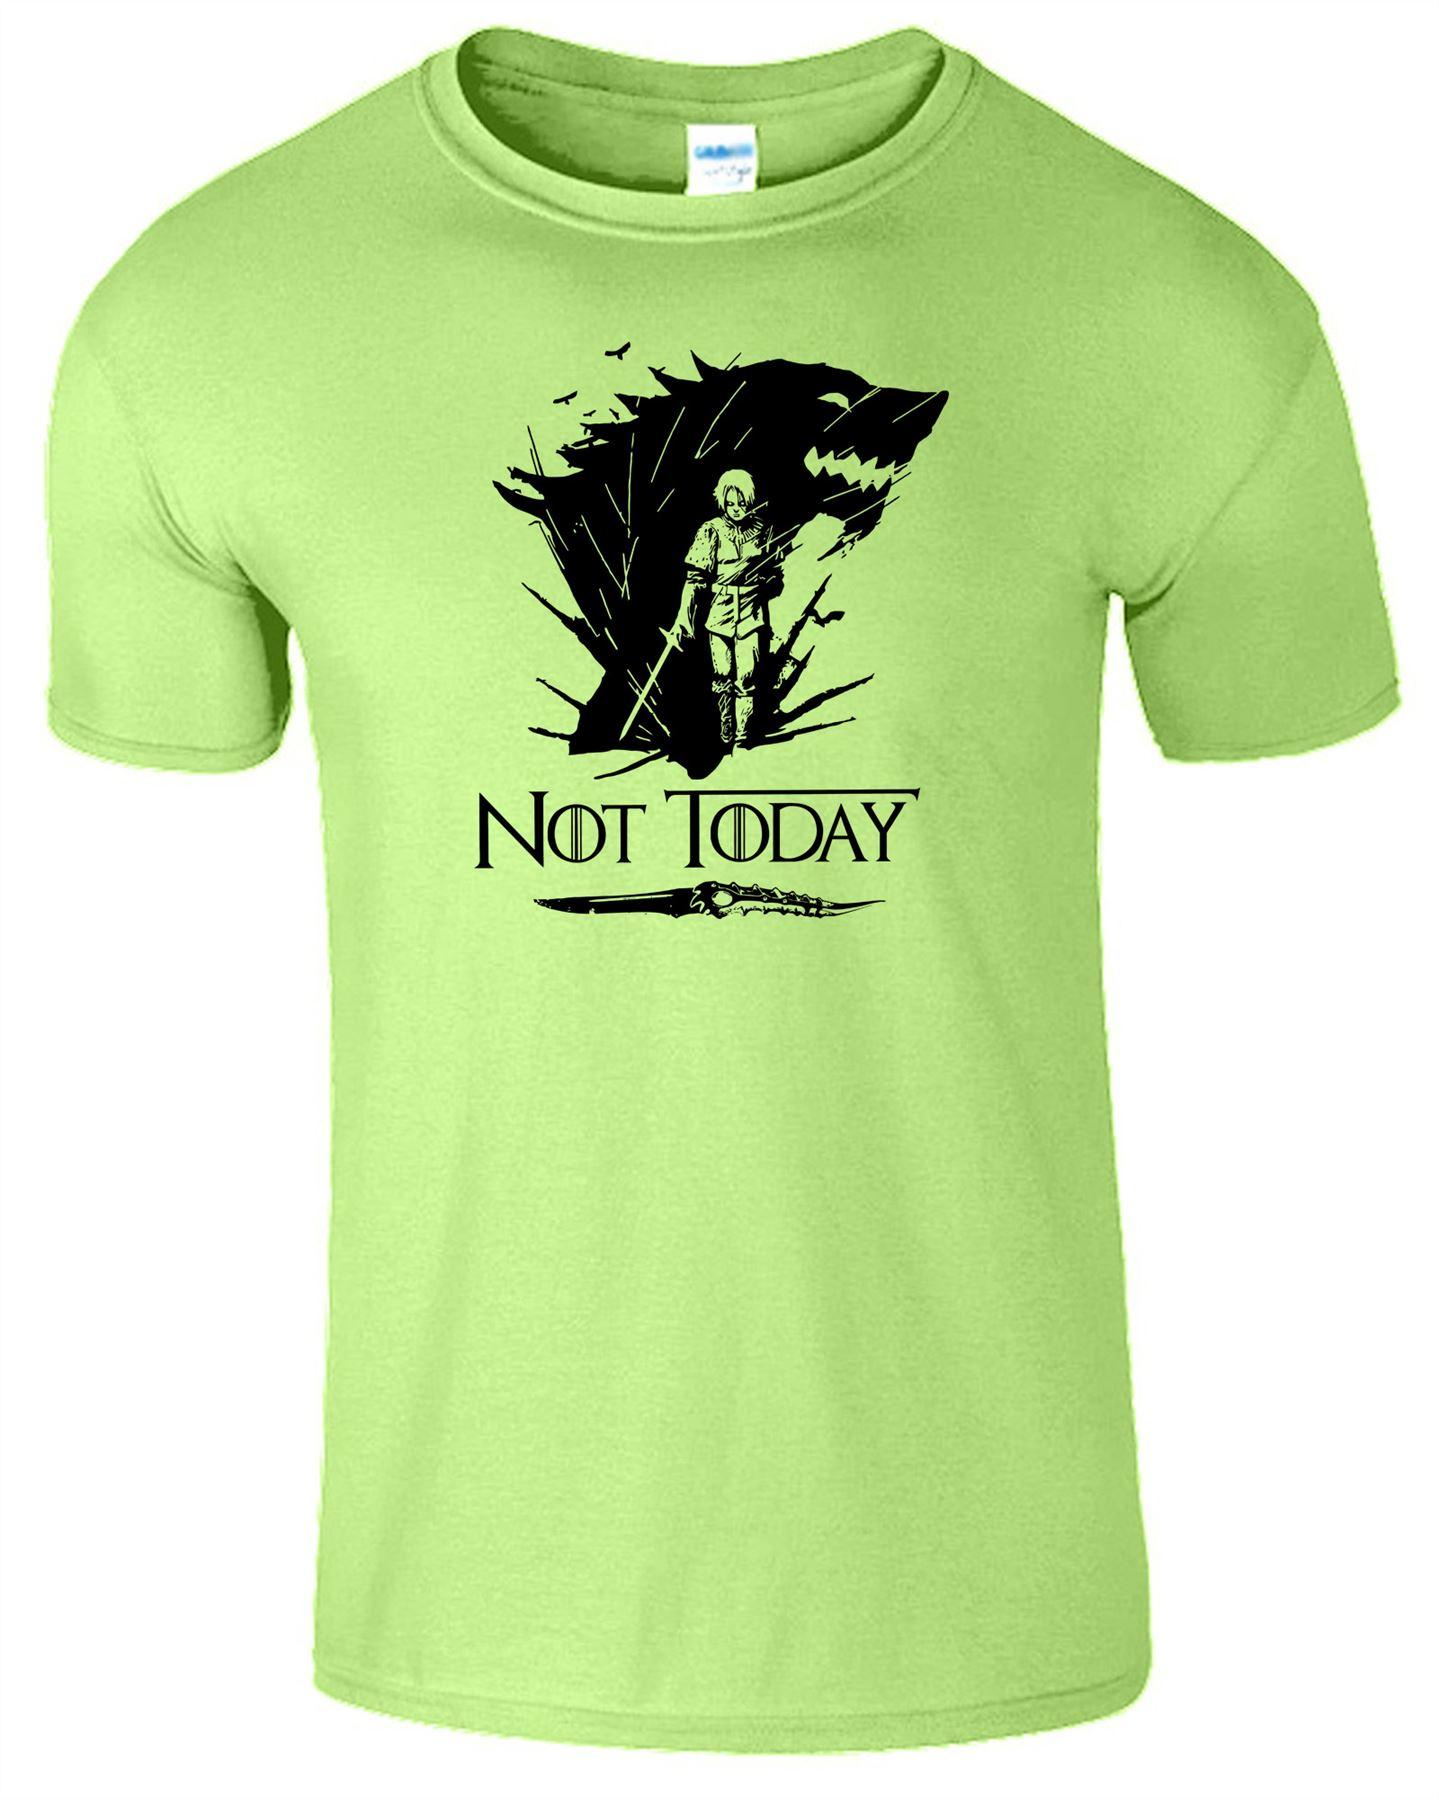 Arya-Stark-Not-Today-T-Shirt-Mens-Game-Season-Womens-Shirt-Adults-Unisex-Fit Indexbild 32